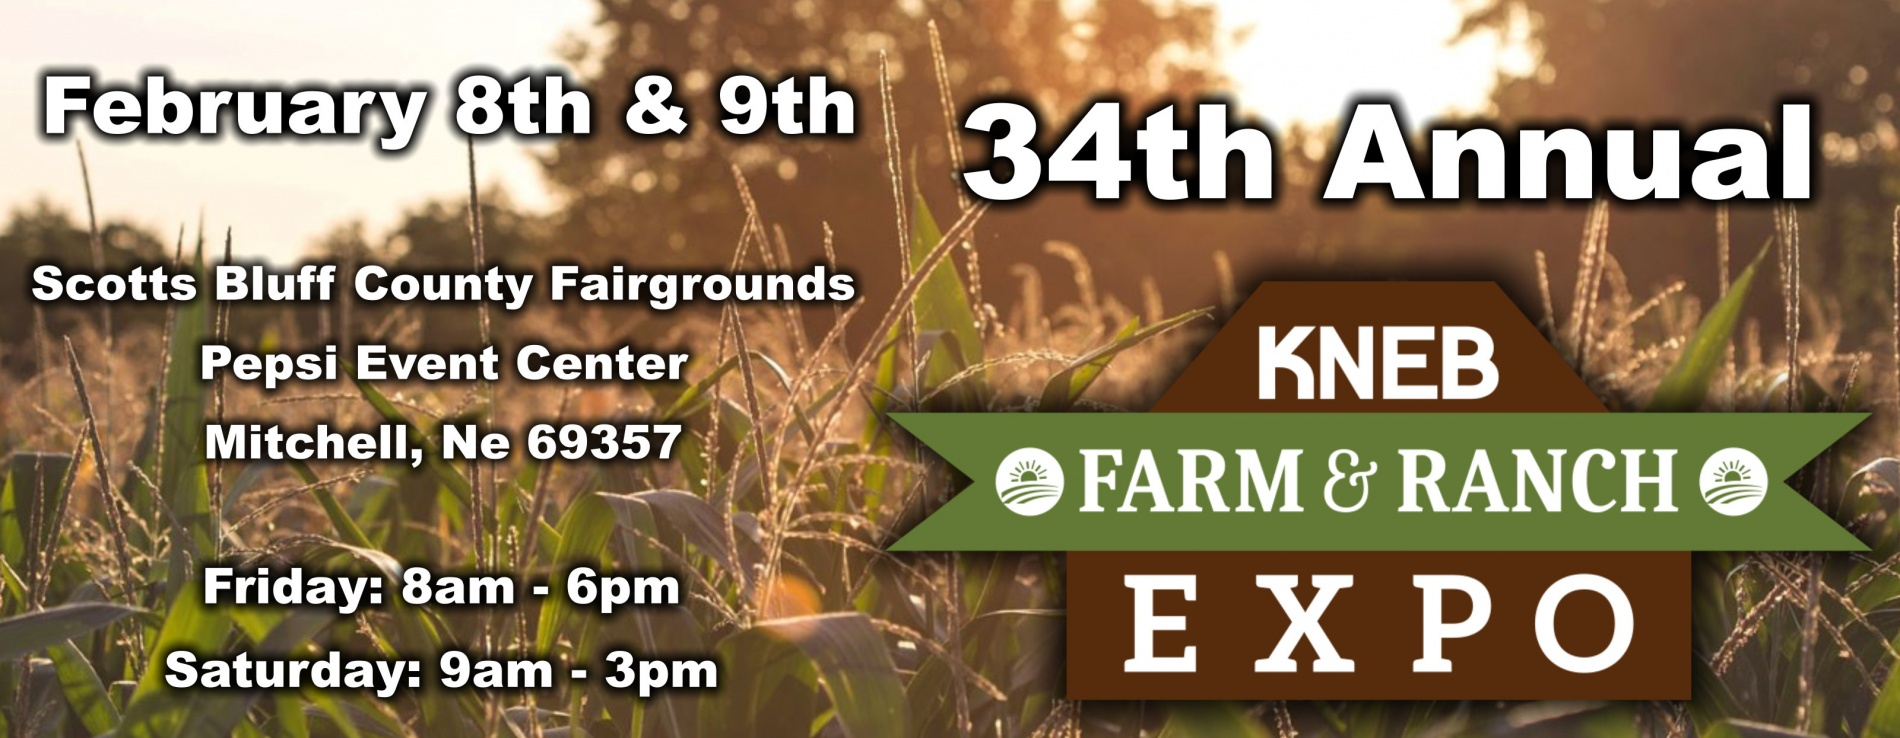 Farm Show Promo 2